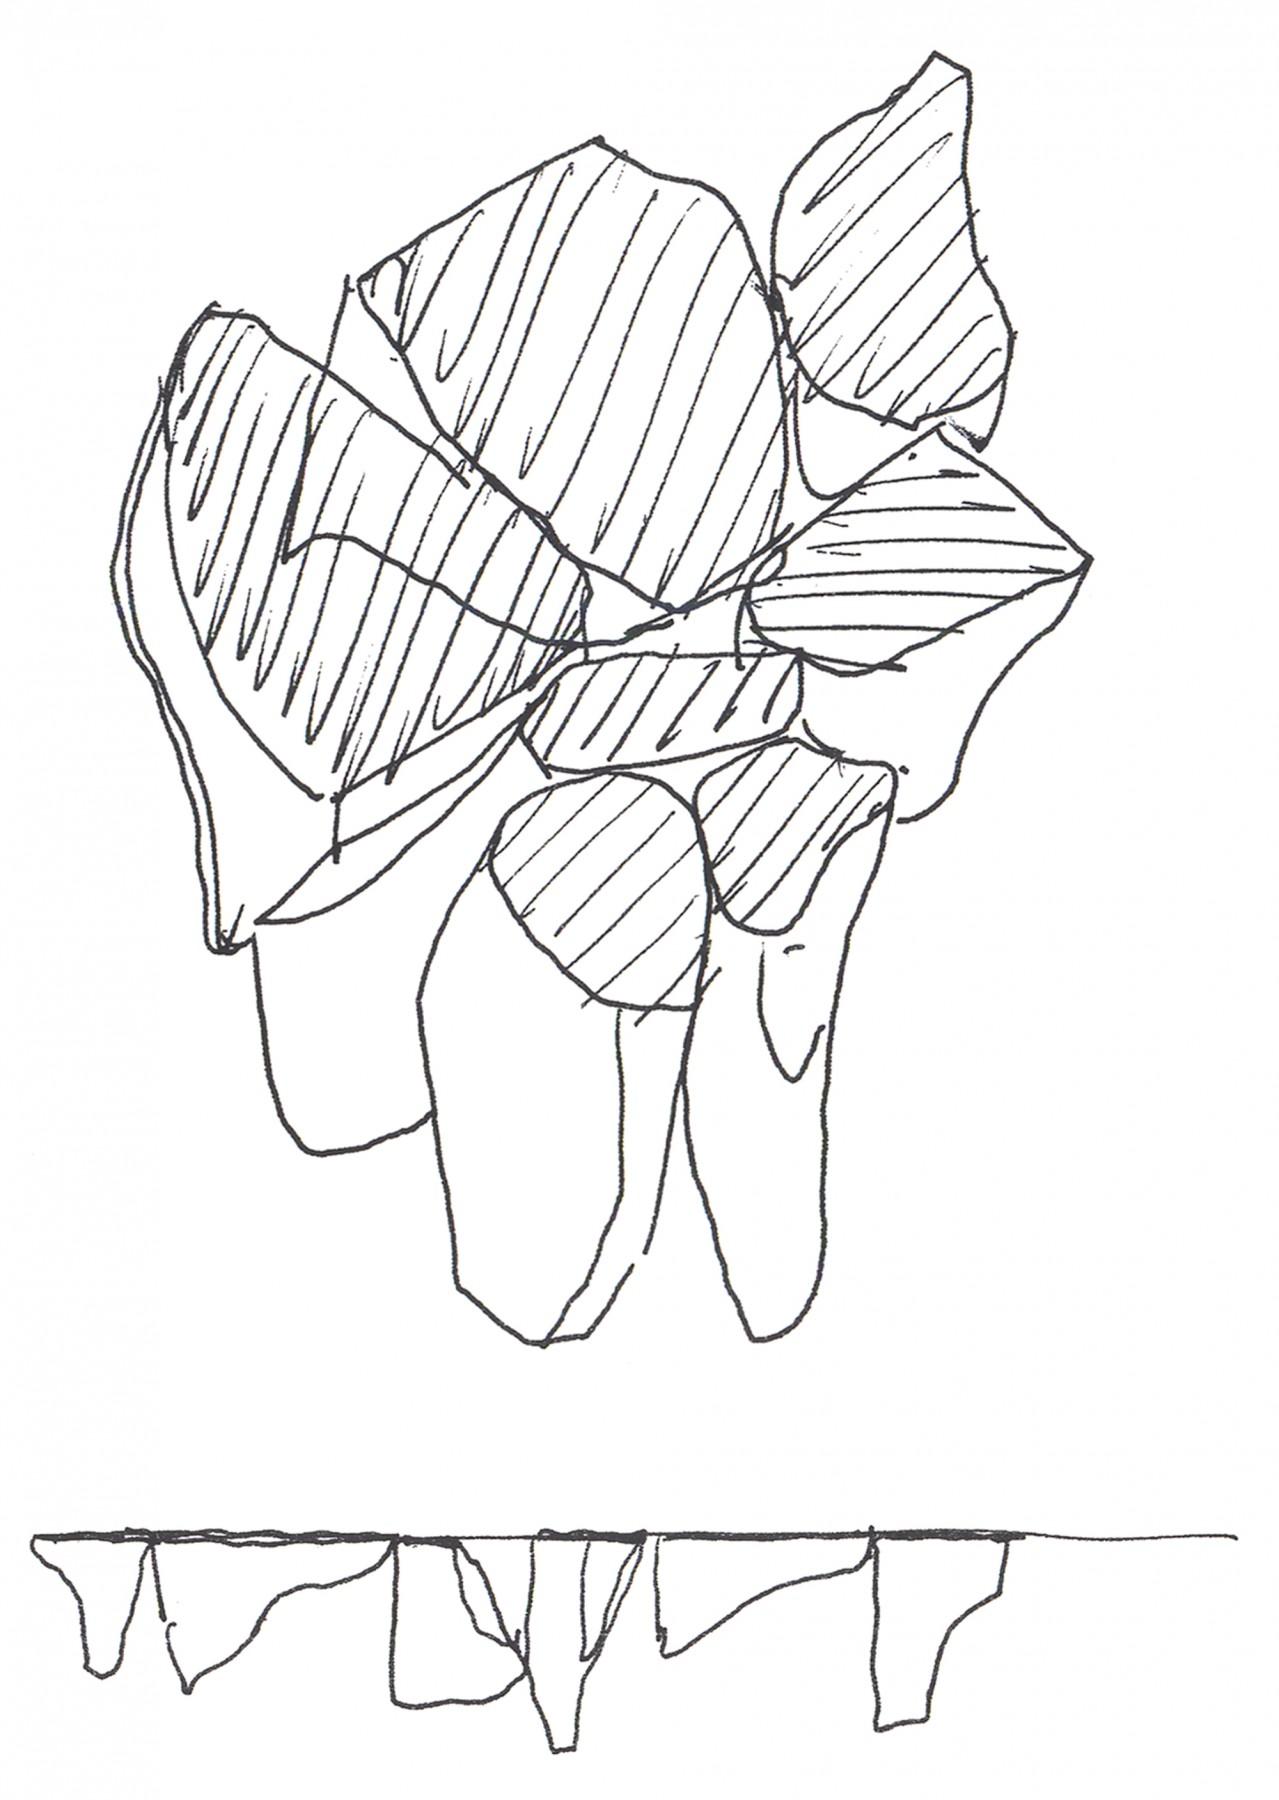 Selfridges-London-designer-fashion-retail-Jamie-Fobert-Architects-shop-shoe-last-table-galleries-sketches-2